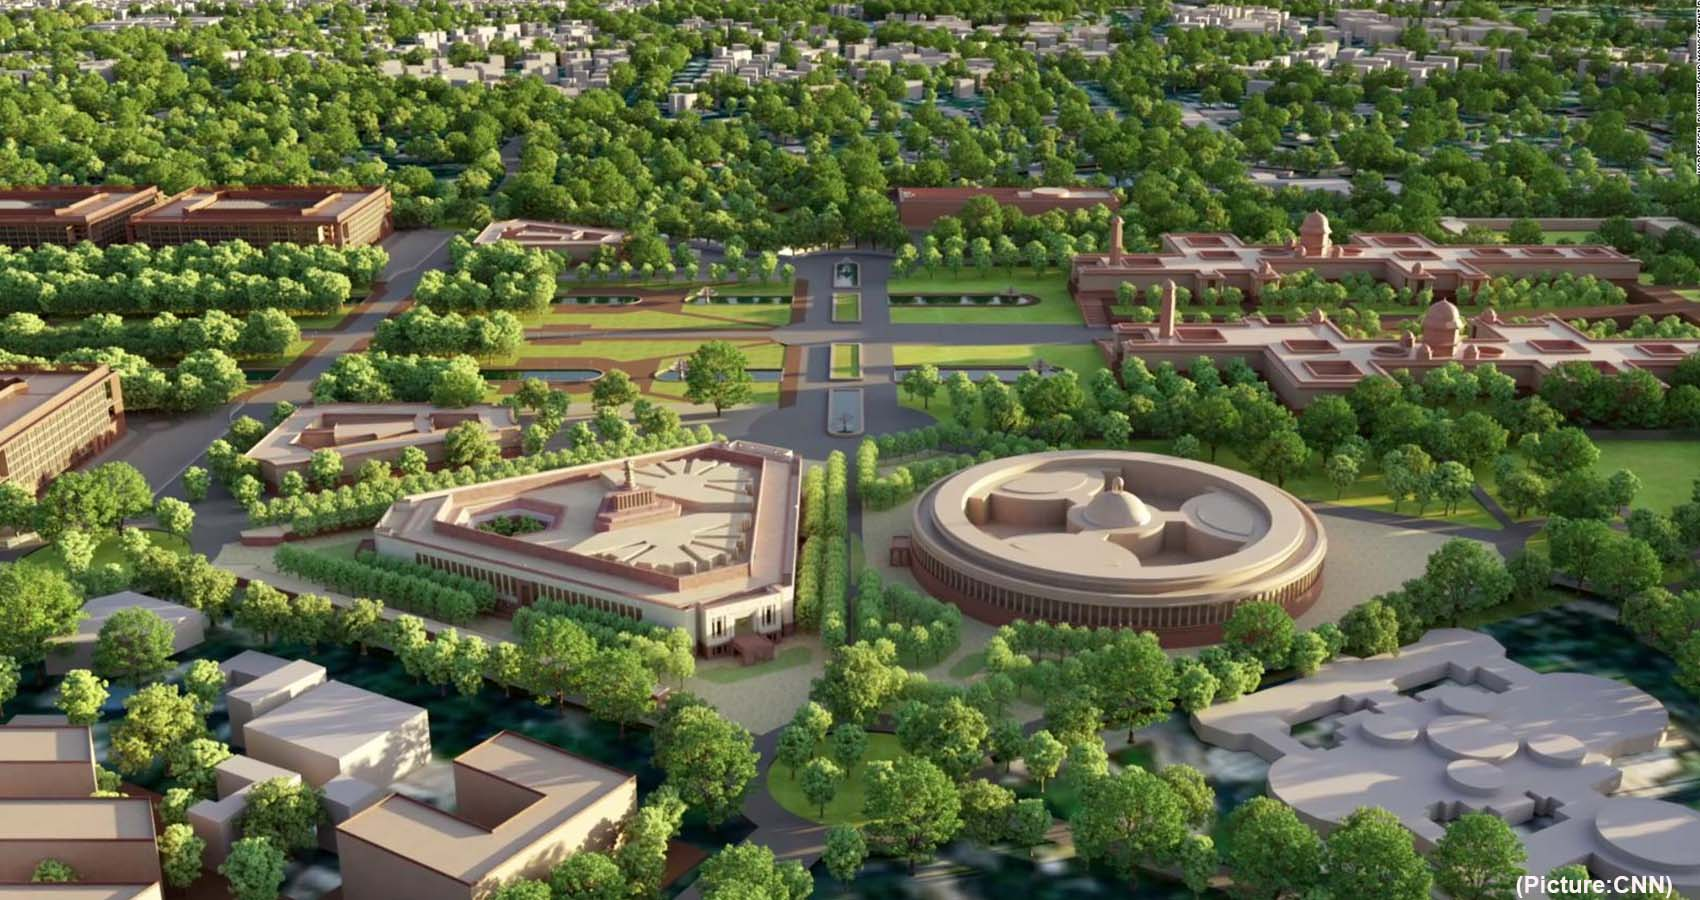 $400-Billion New City In The American Desert Planned